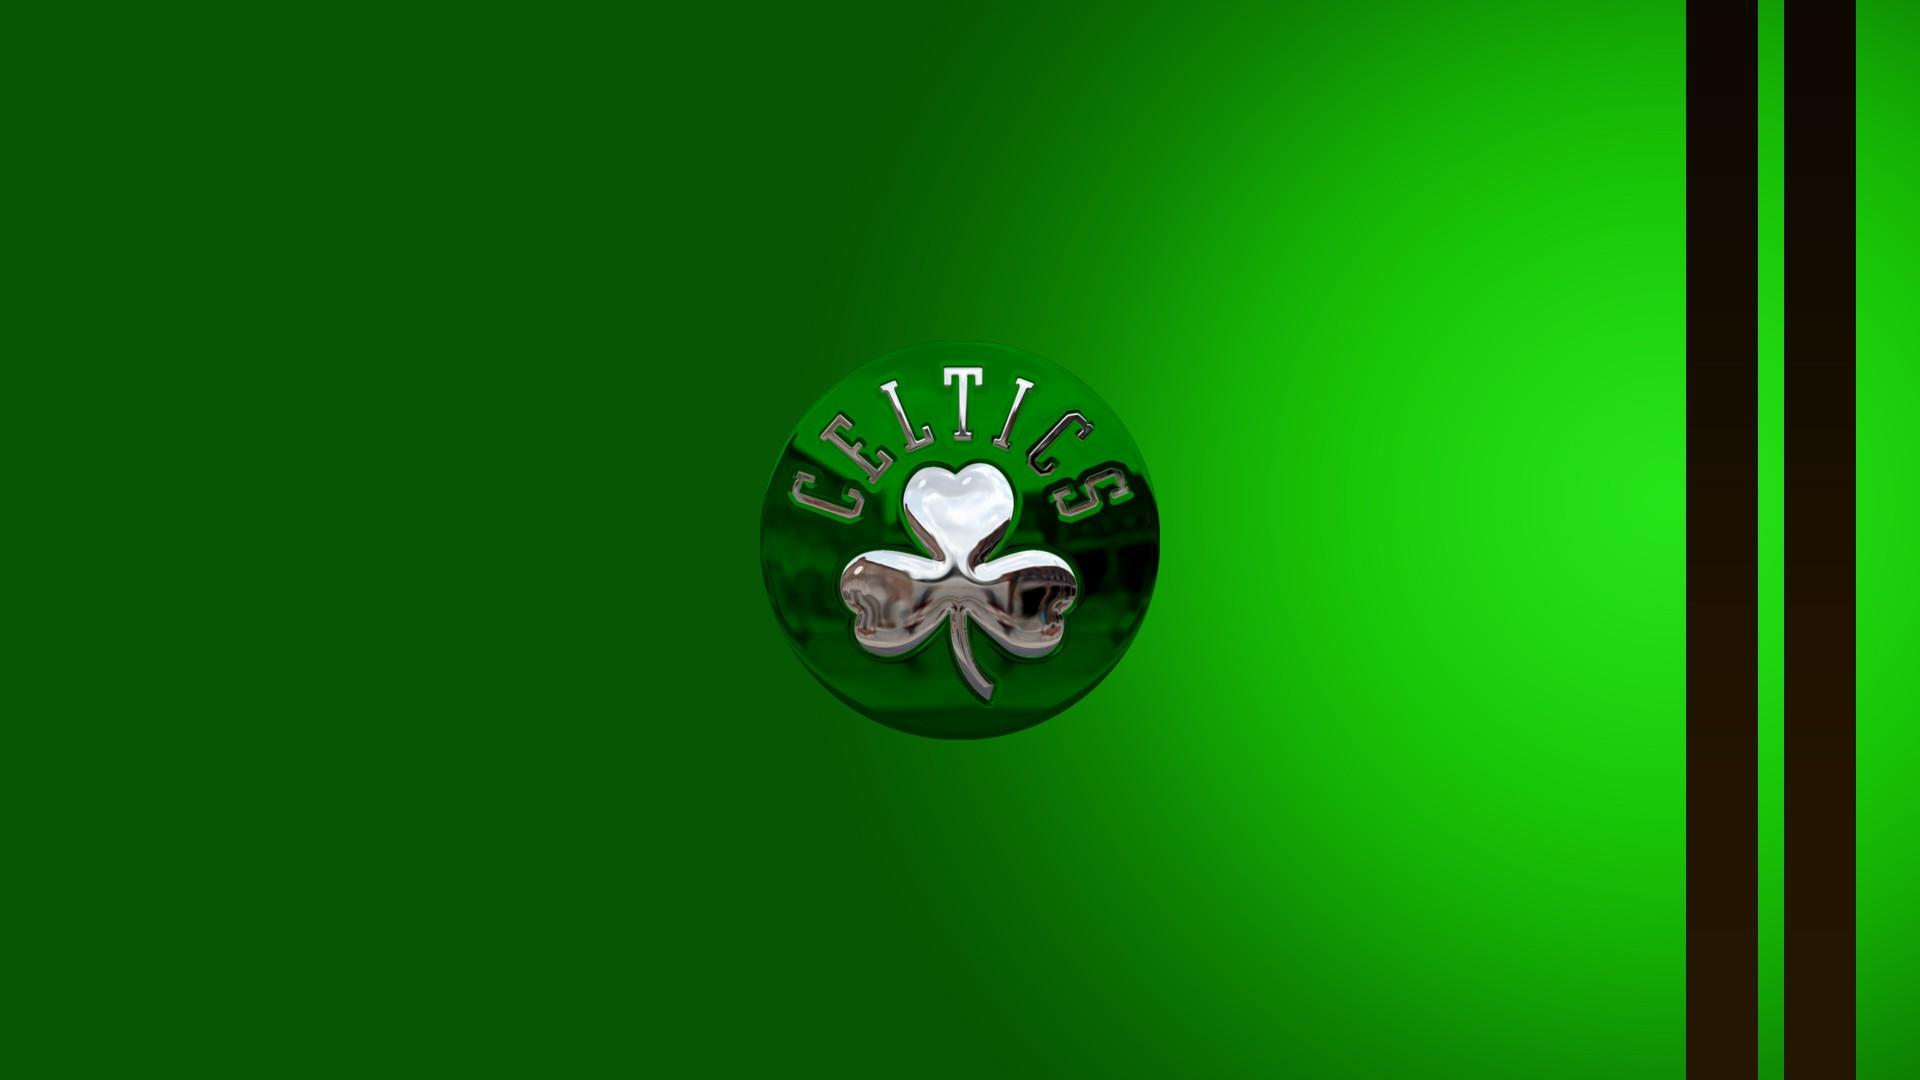 Boston Celtics Desktop Wallpapers 2019 Basketball Wallpaper 1920x1080